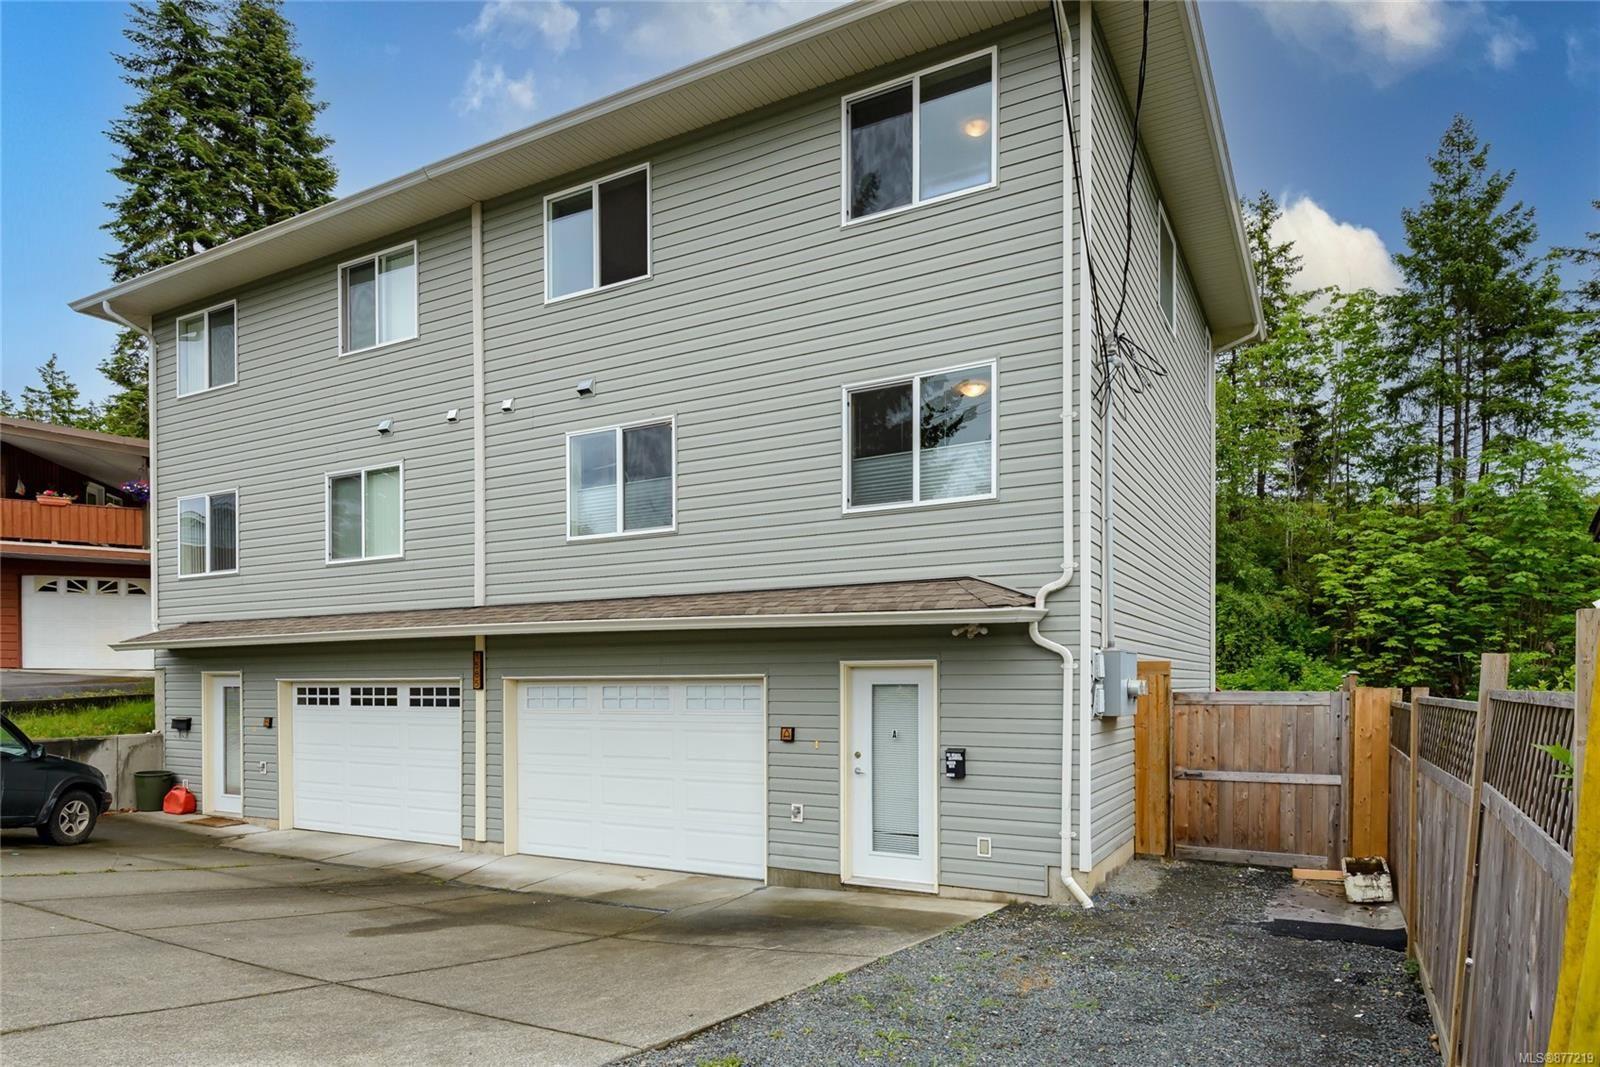 Main Photo: a 1585 Valley Cres in : CV Courtenay East Half Duplex for sale (Comox Valley)  : MLS®# 877219